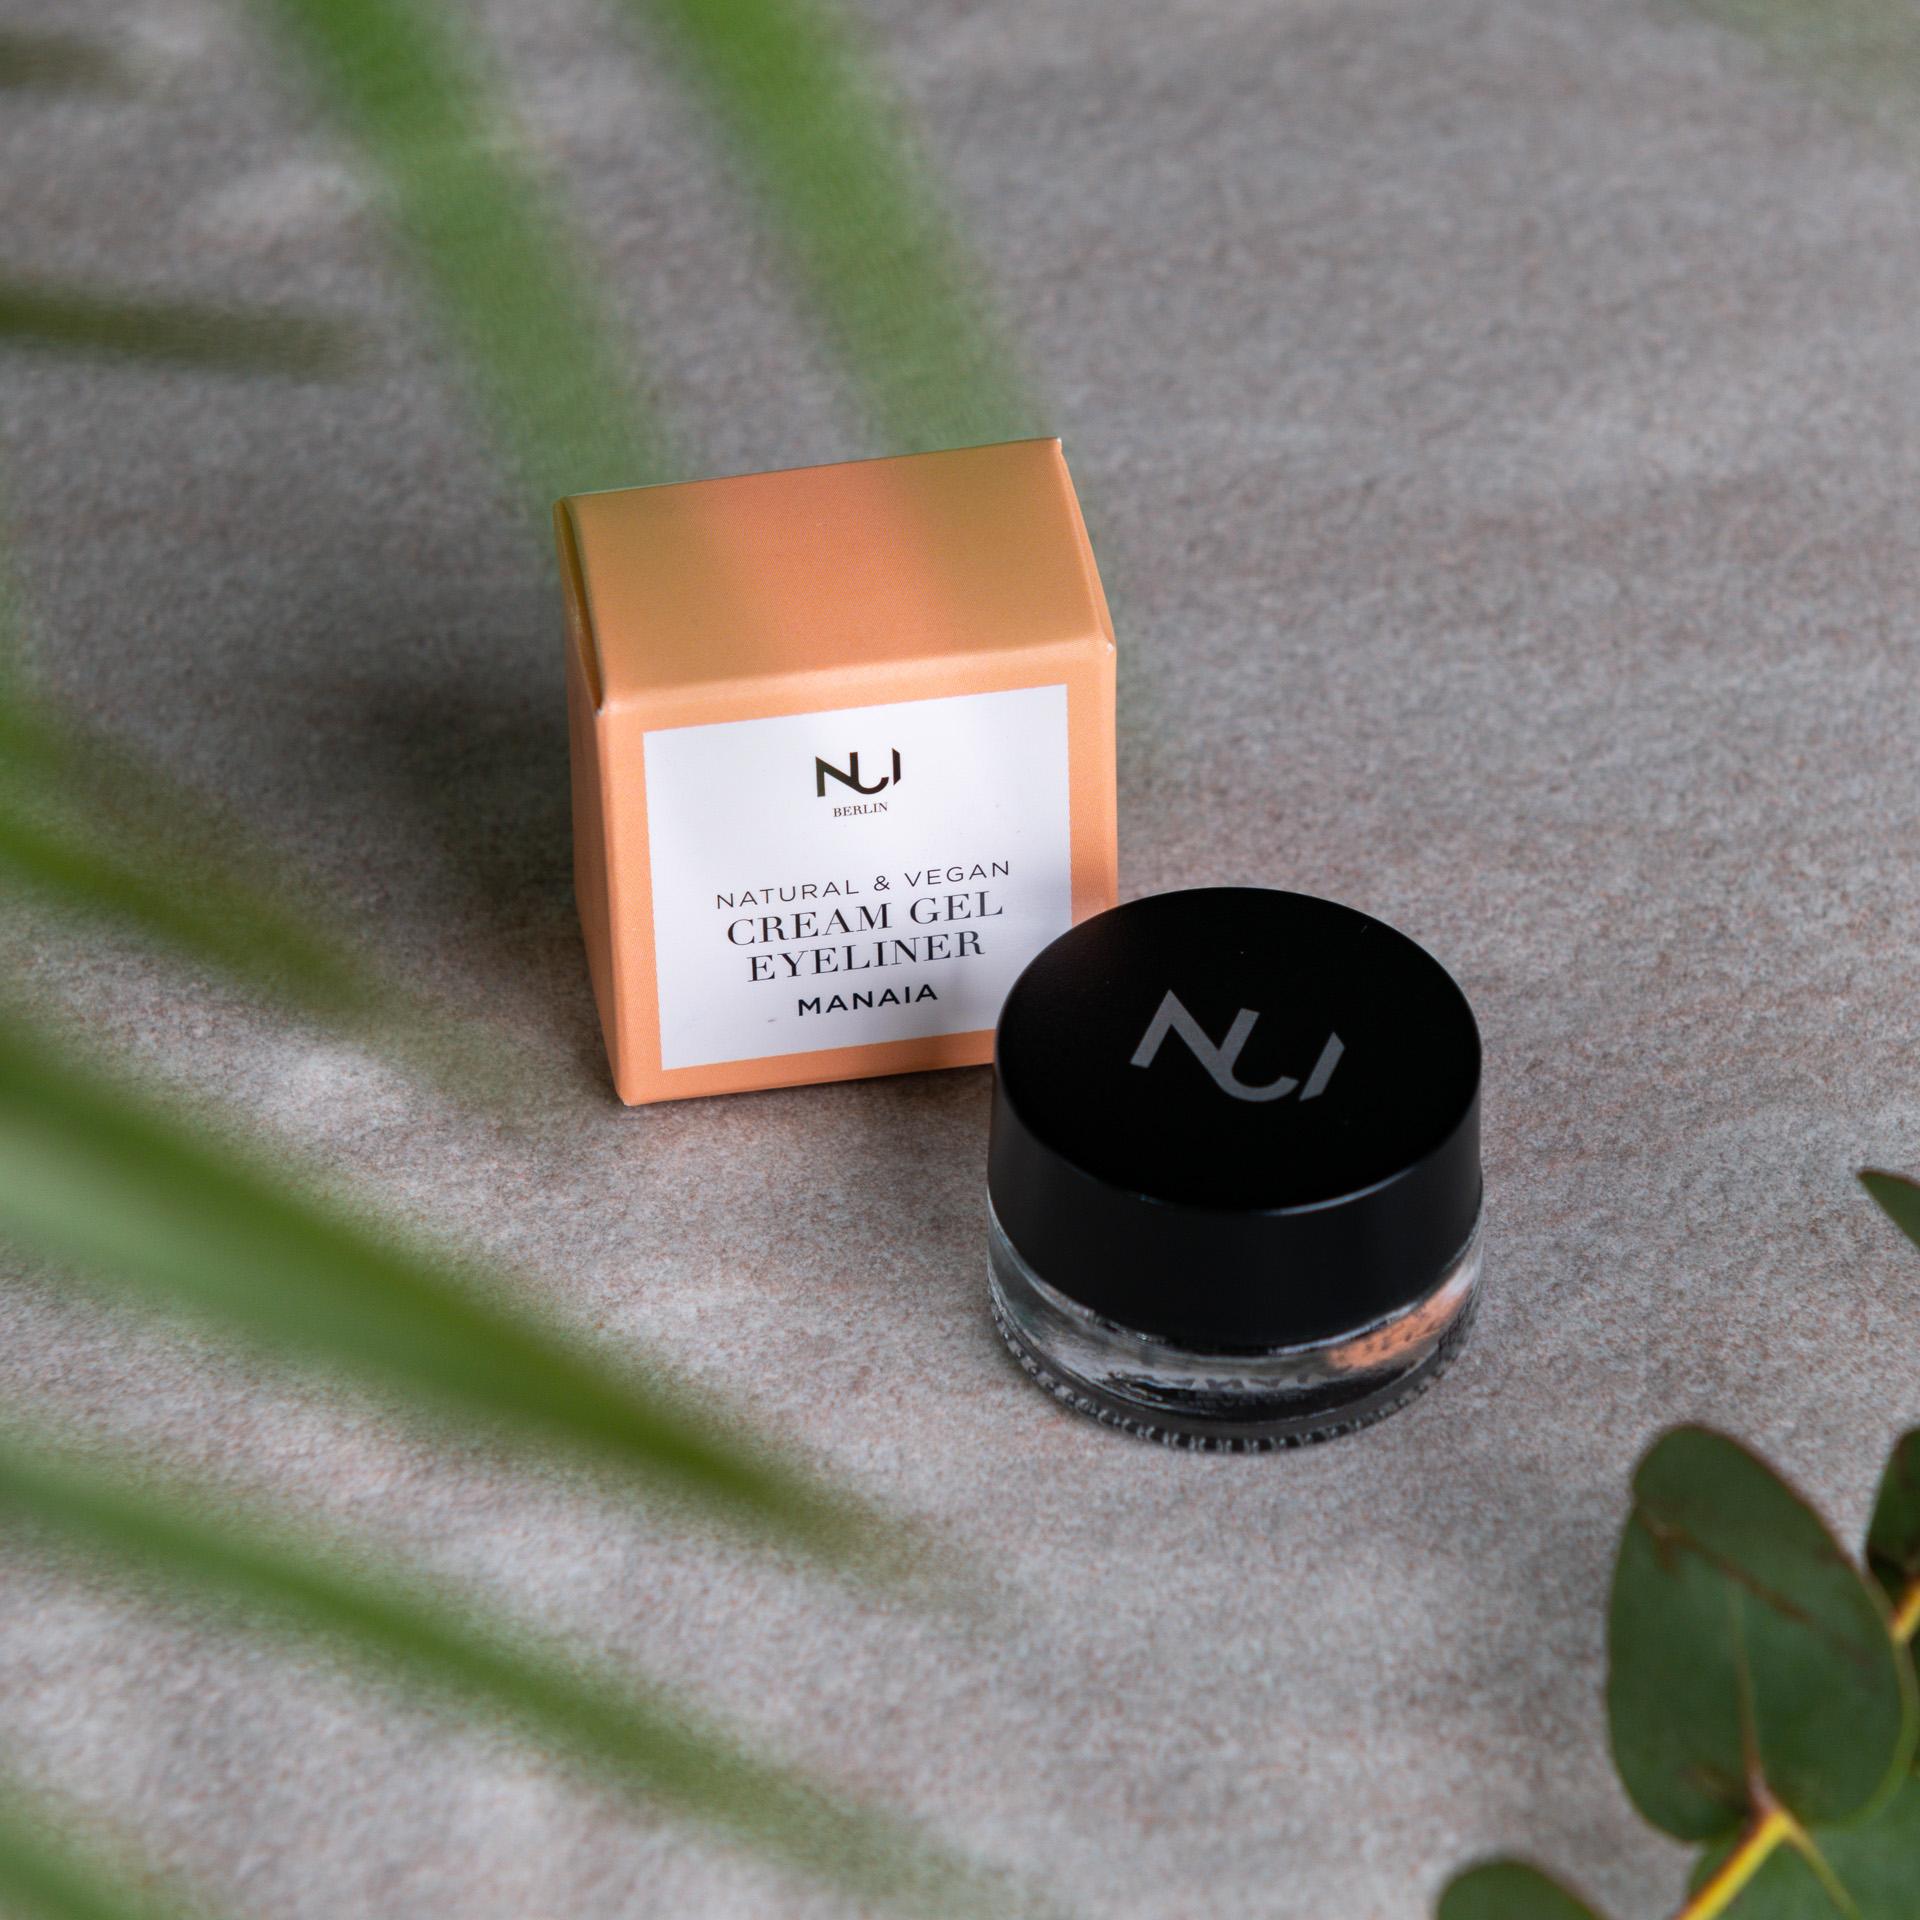 NUI Natural Cream Gel Eyeliner MANAIA